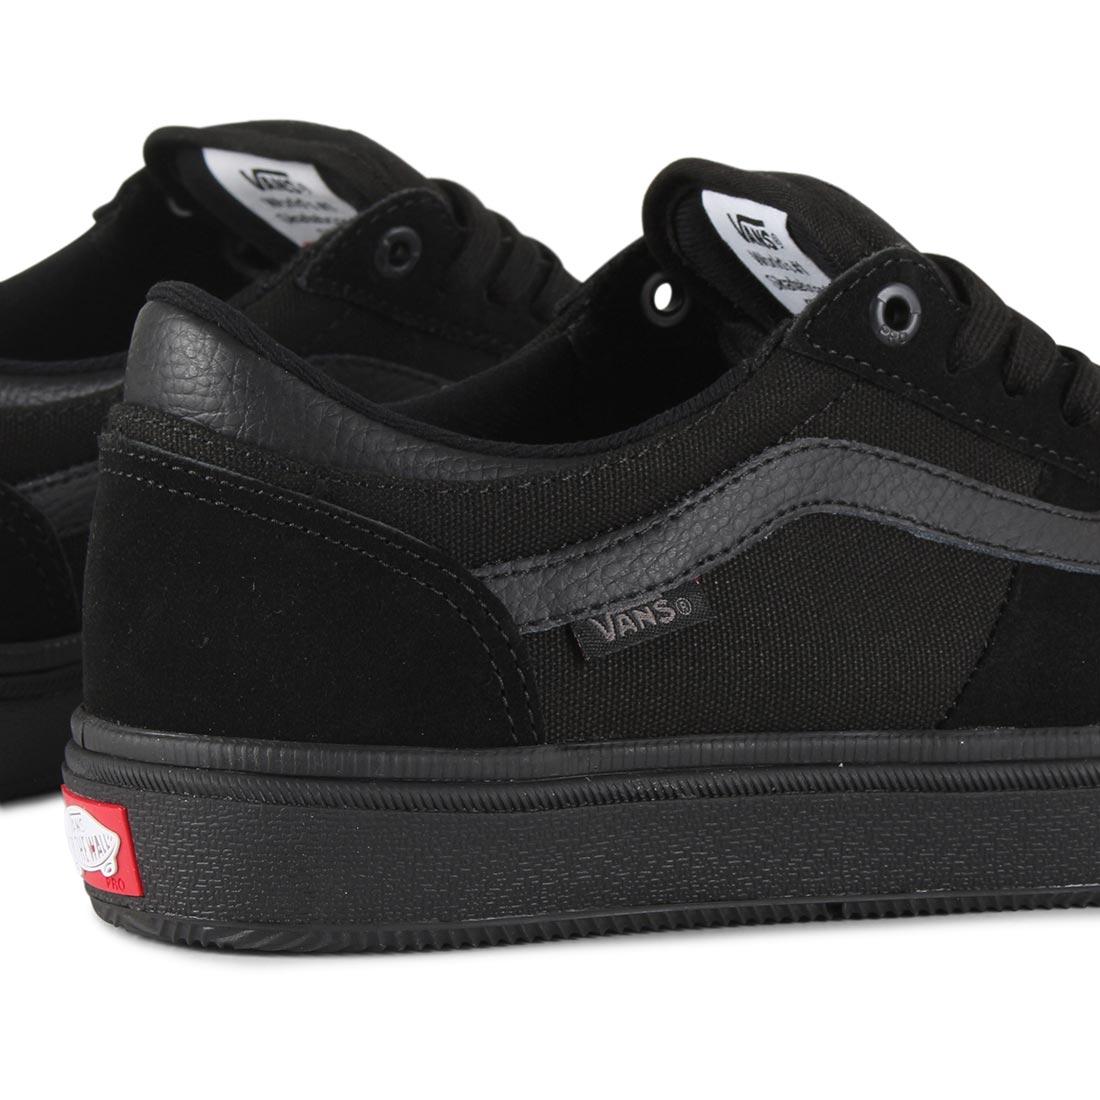 a597c88112 ... Vans-Gilbert-Crockett-2-Pro-Shoes-Suede-Blackout ...